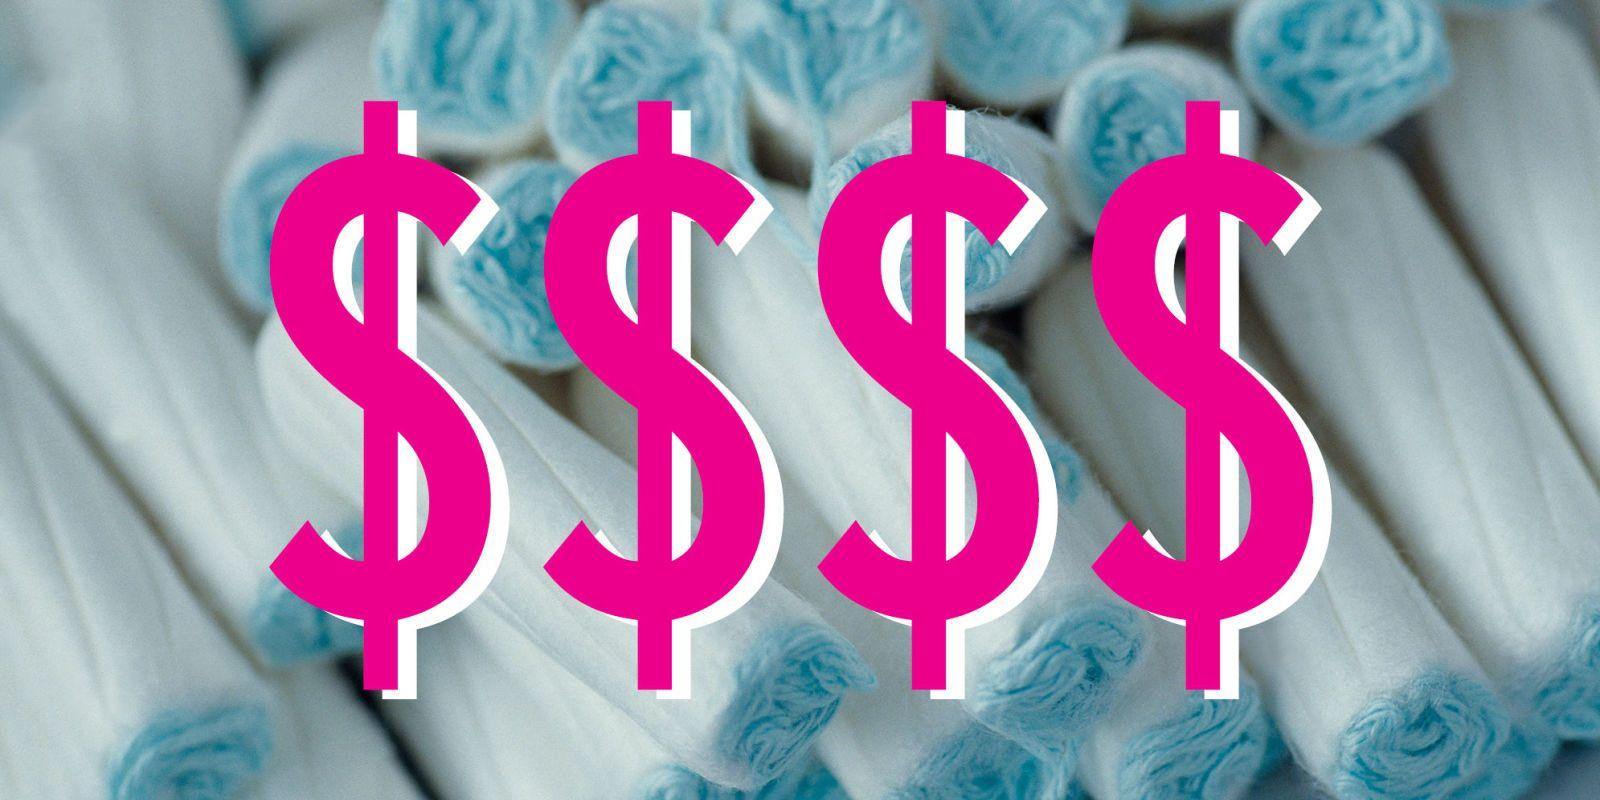 tampon tax persuasive essay